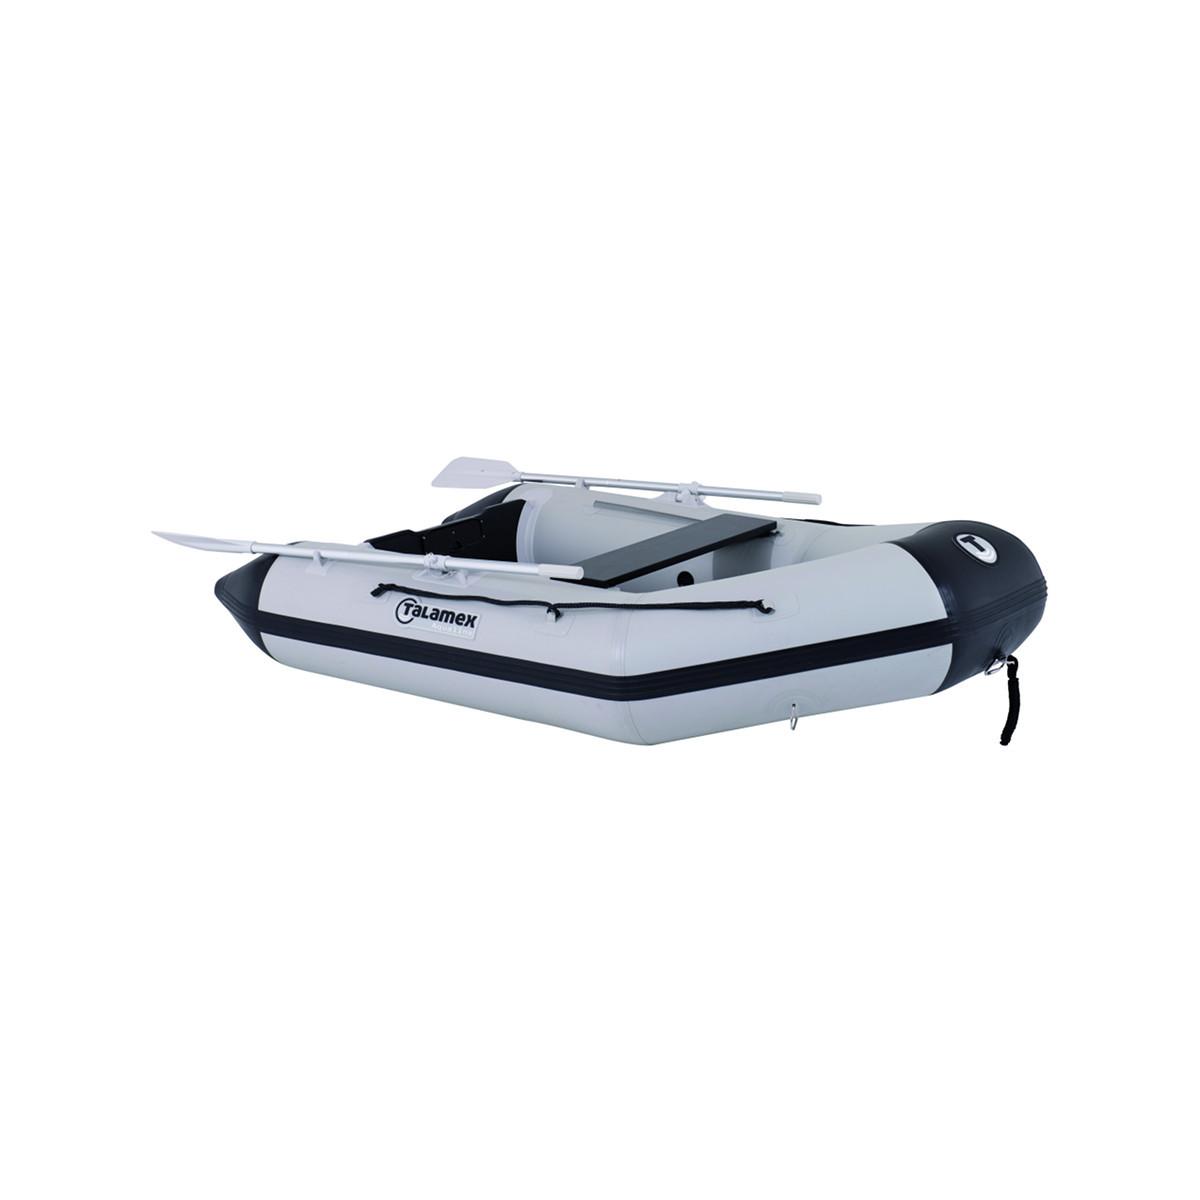 Talamex Aqualine QLS250 opblaasbare rubberboot met lattenbodem, lengte 2,50m, grijs